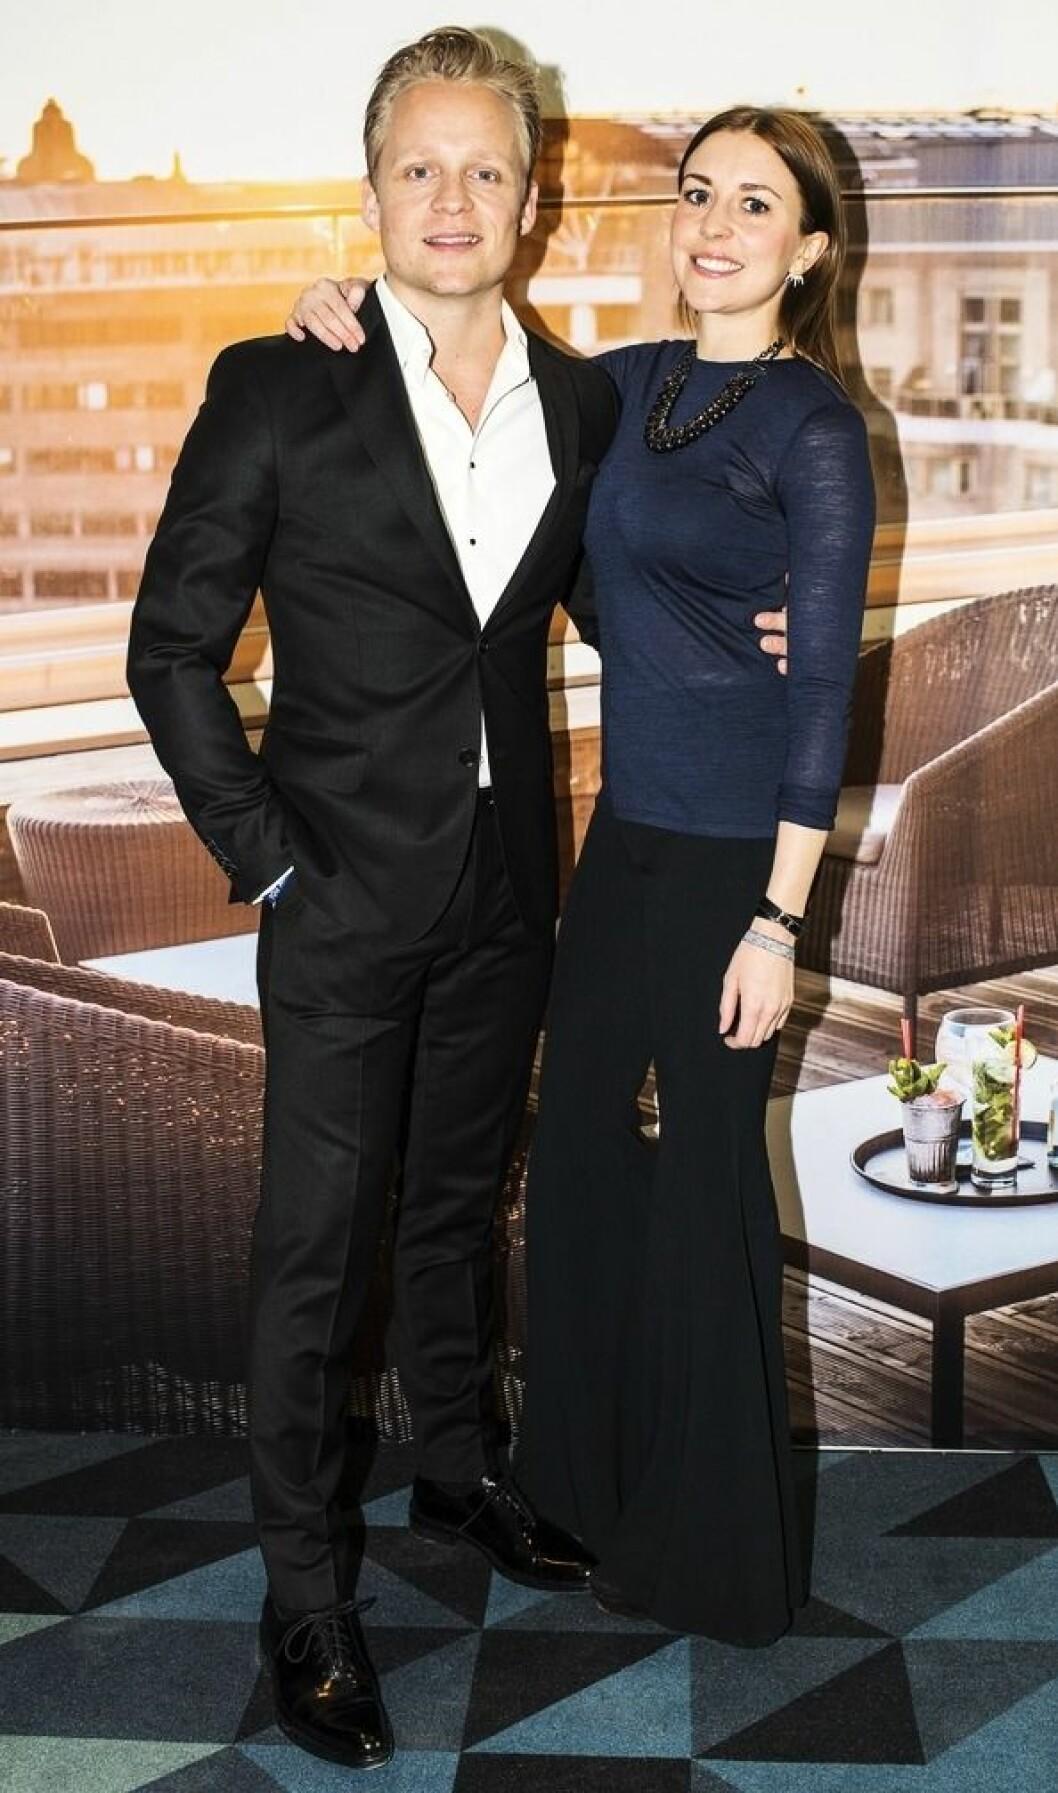 Andreas Weise och Sofie Brange